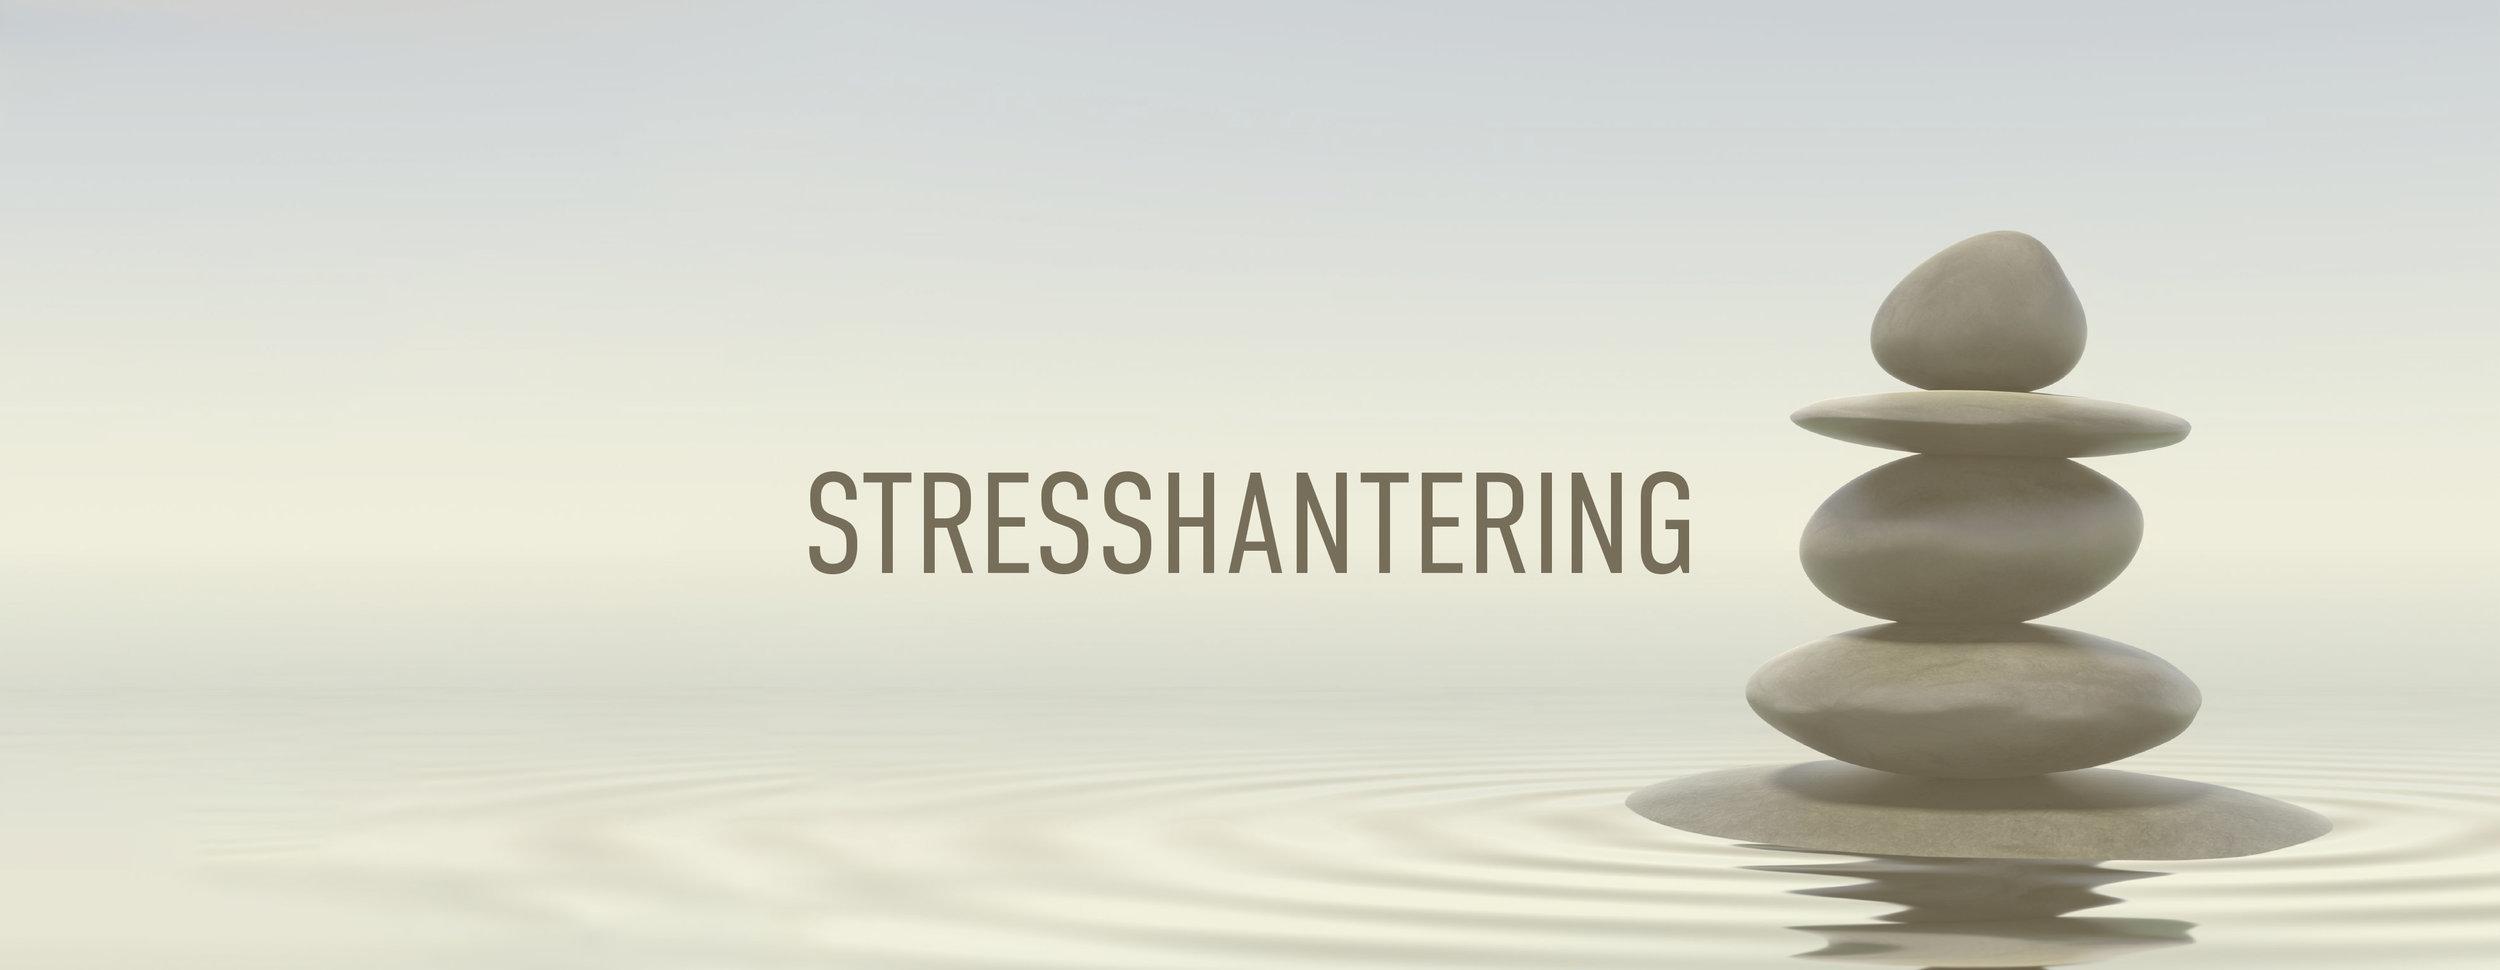 stresshantering.jpg